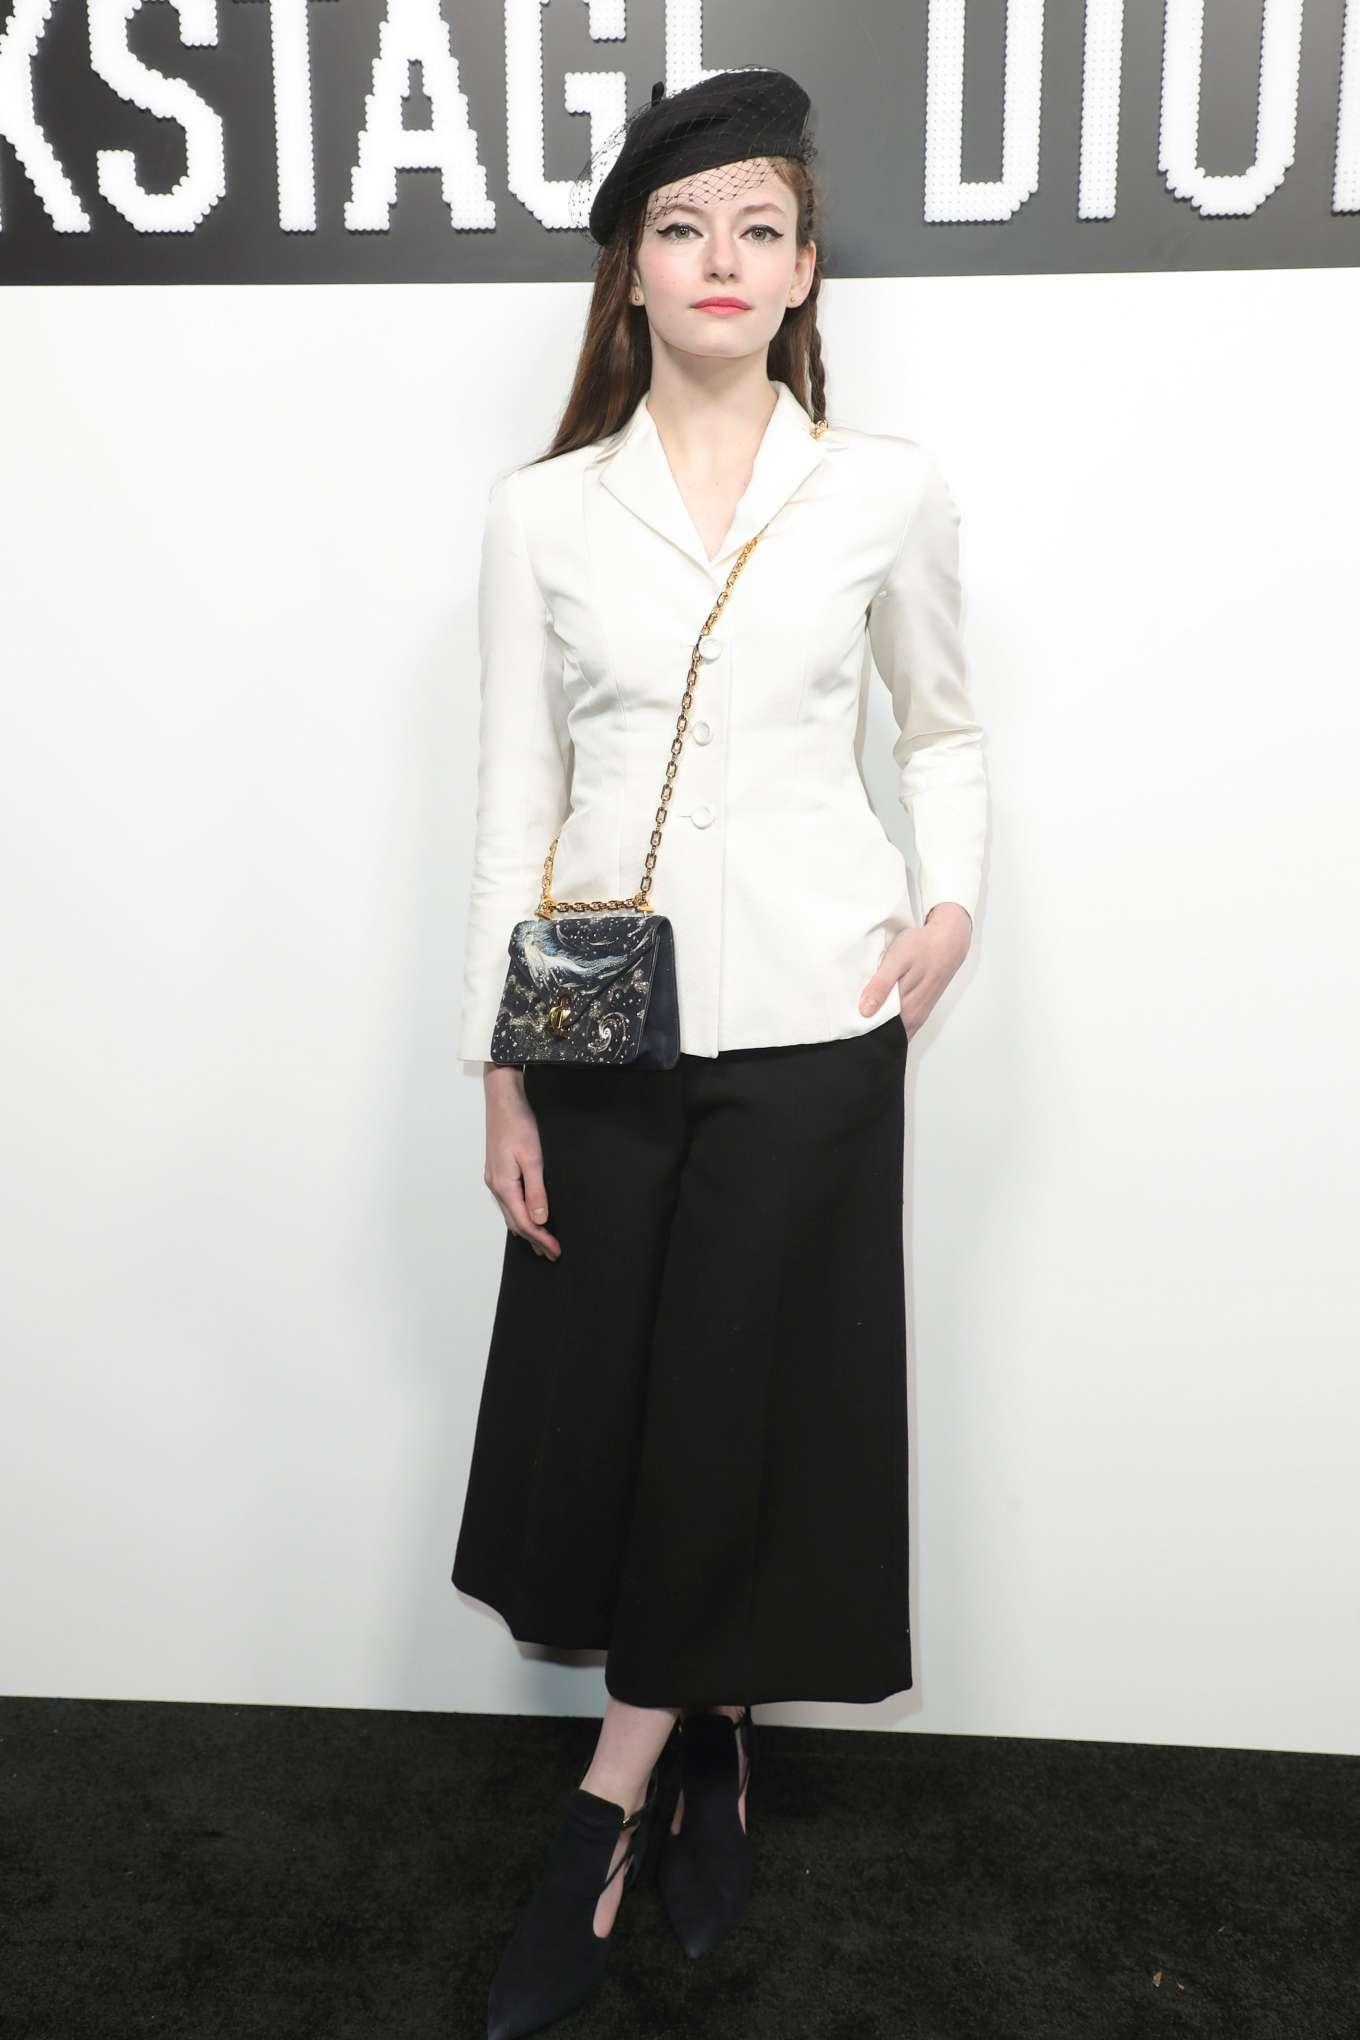 Mackenzie Foy - Dior Beauty Pop Up in Los Angeles